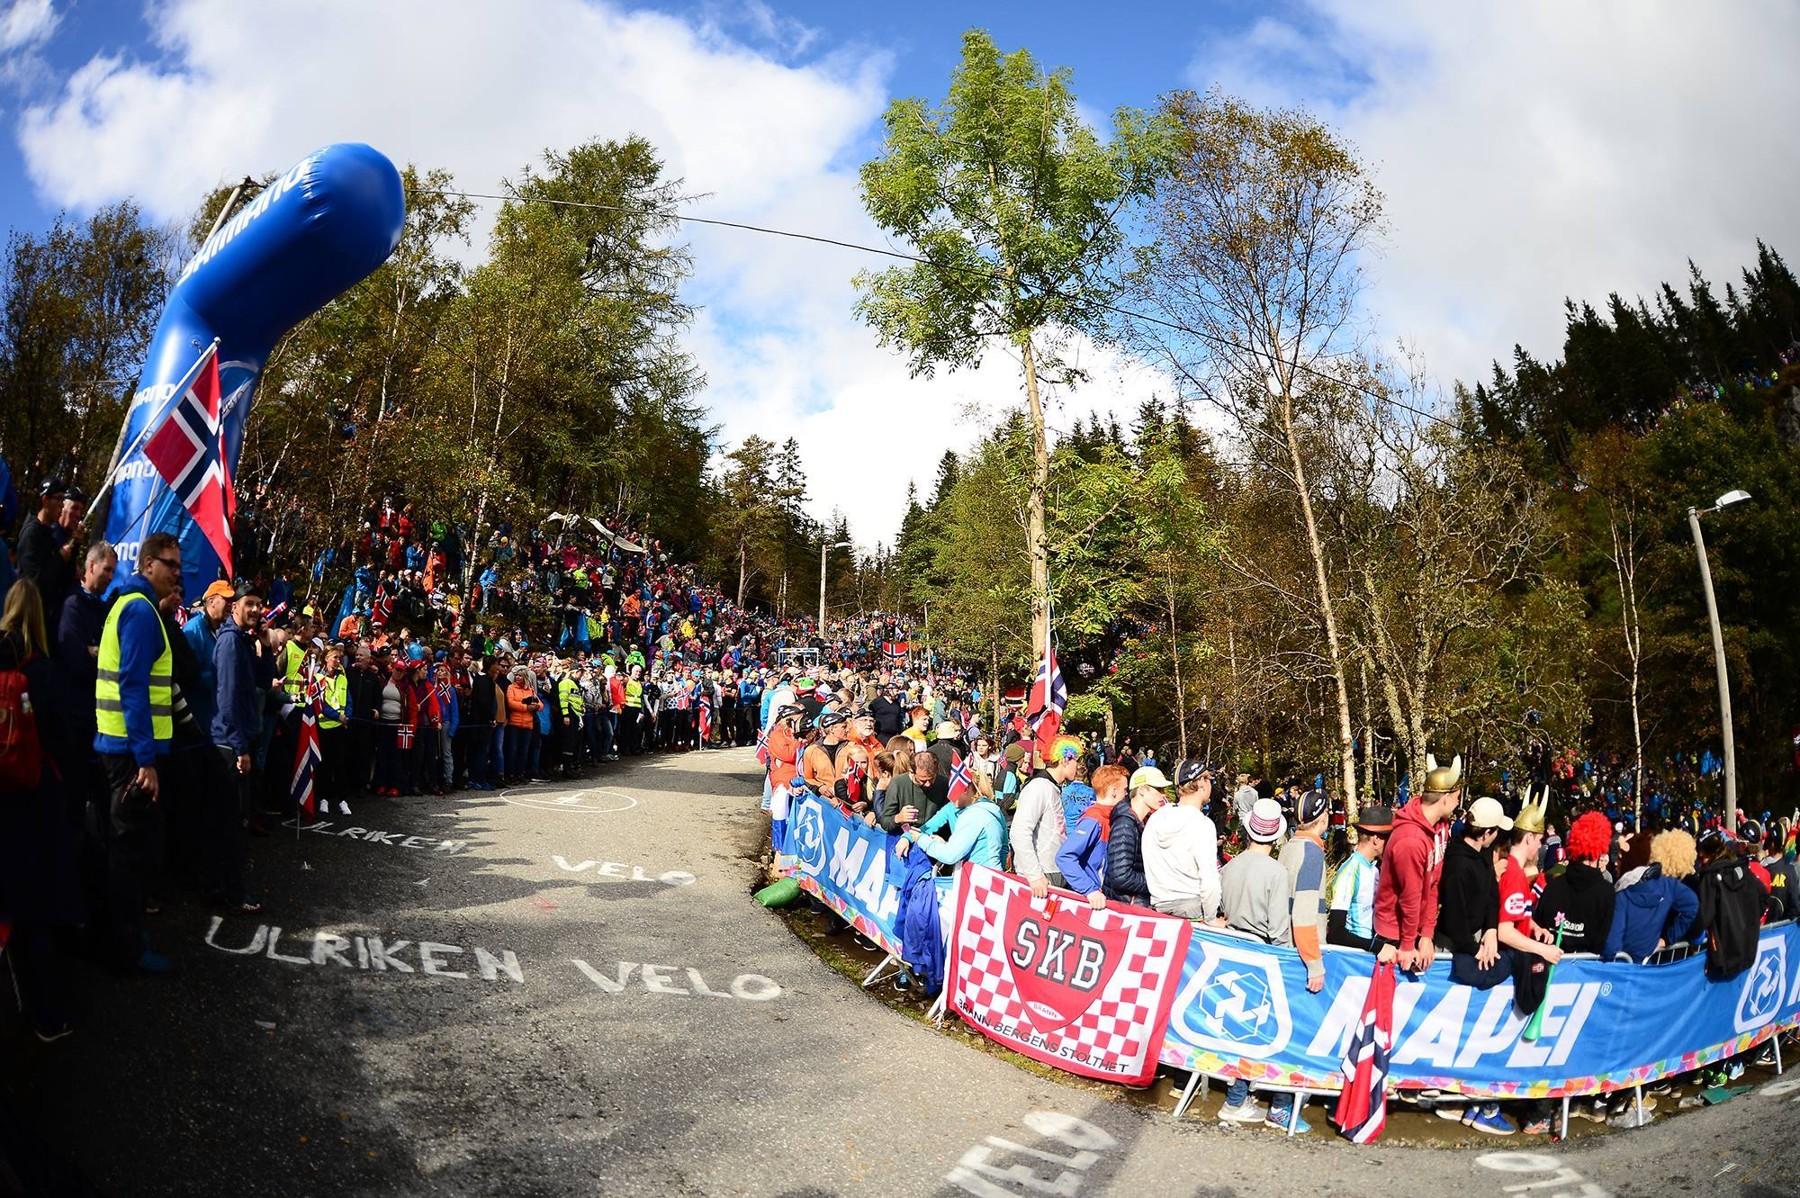 Sagan-mapei-uci-championship (2)